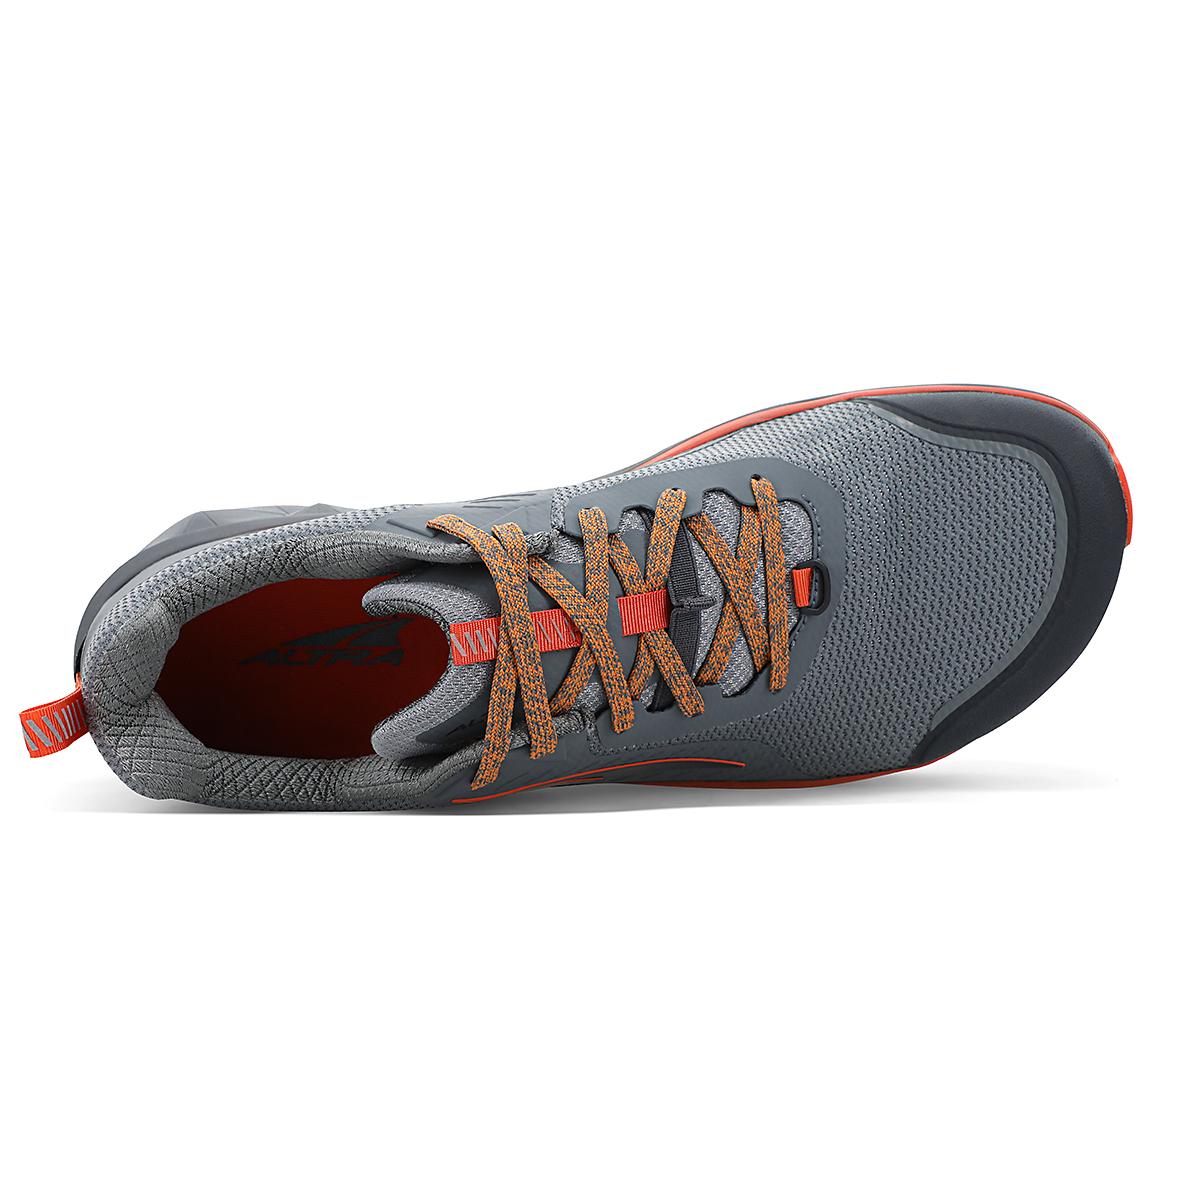 Men's Altra Timp 3 Trail Running Shoe - Color: Gray/Orange - Size: 7 - Width: Regular, Gray/Orange, large, image 3